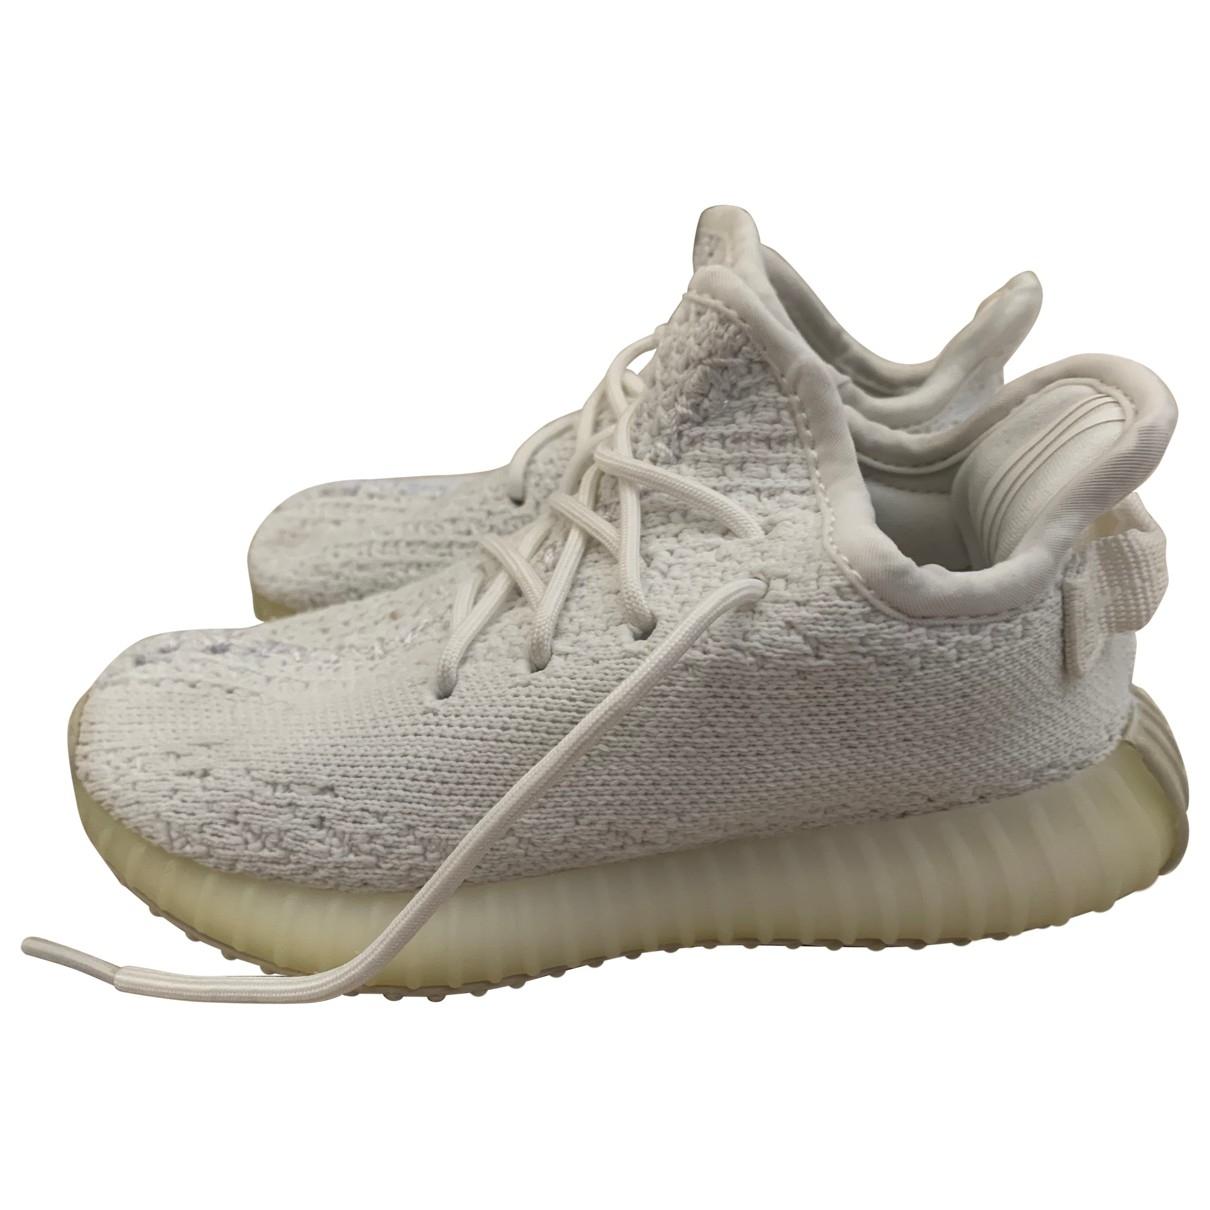 Yeezy X Adidas - Baskets Boost 350 V2 pour enfant en toile - blanc